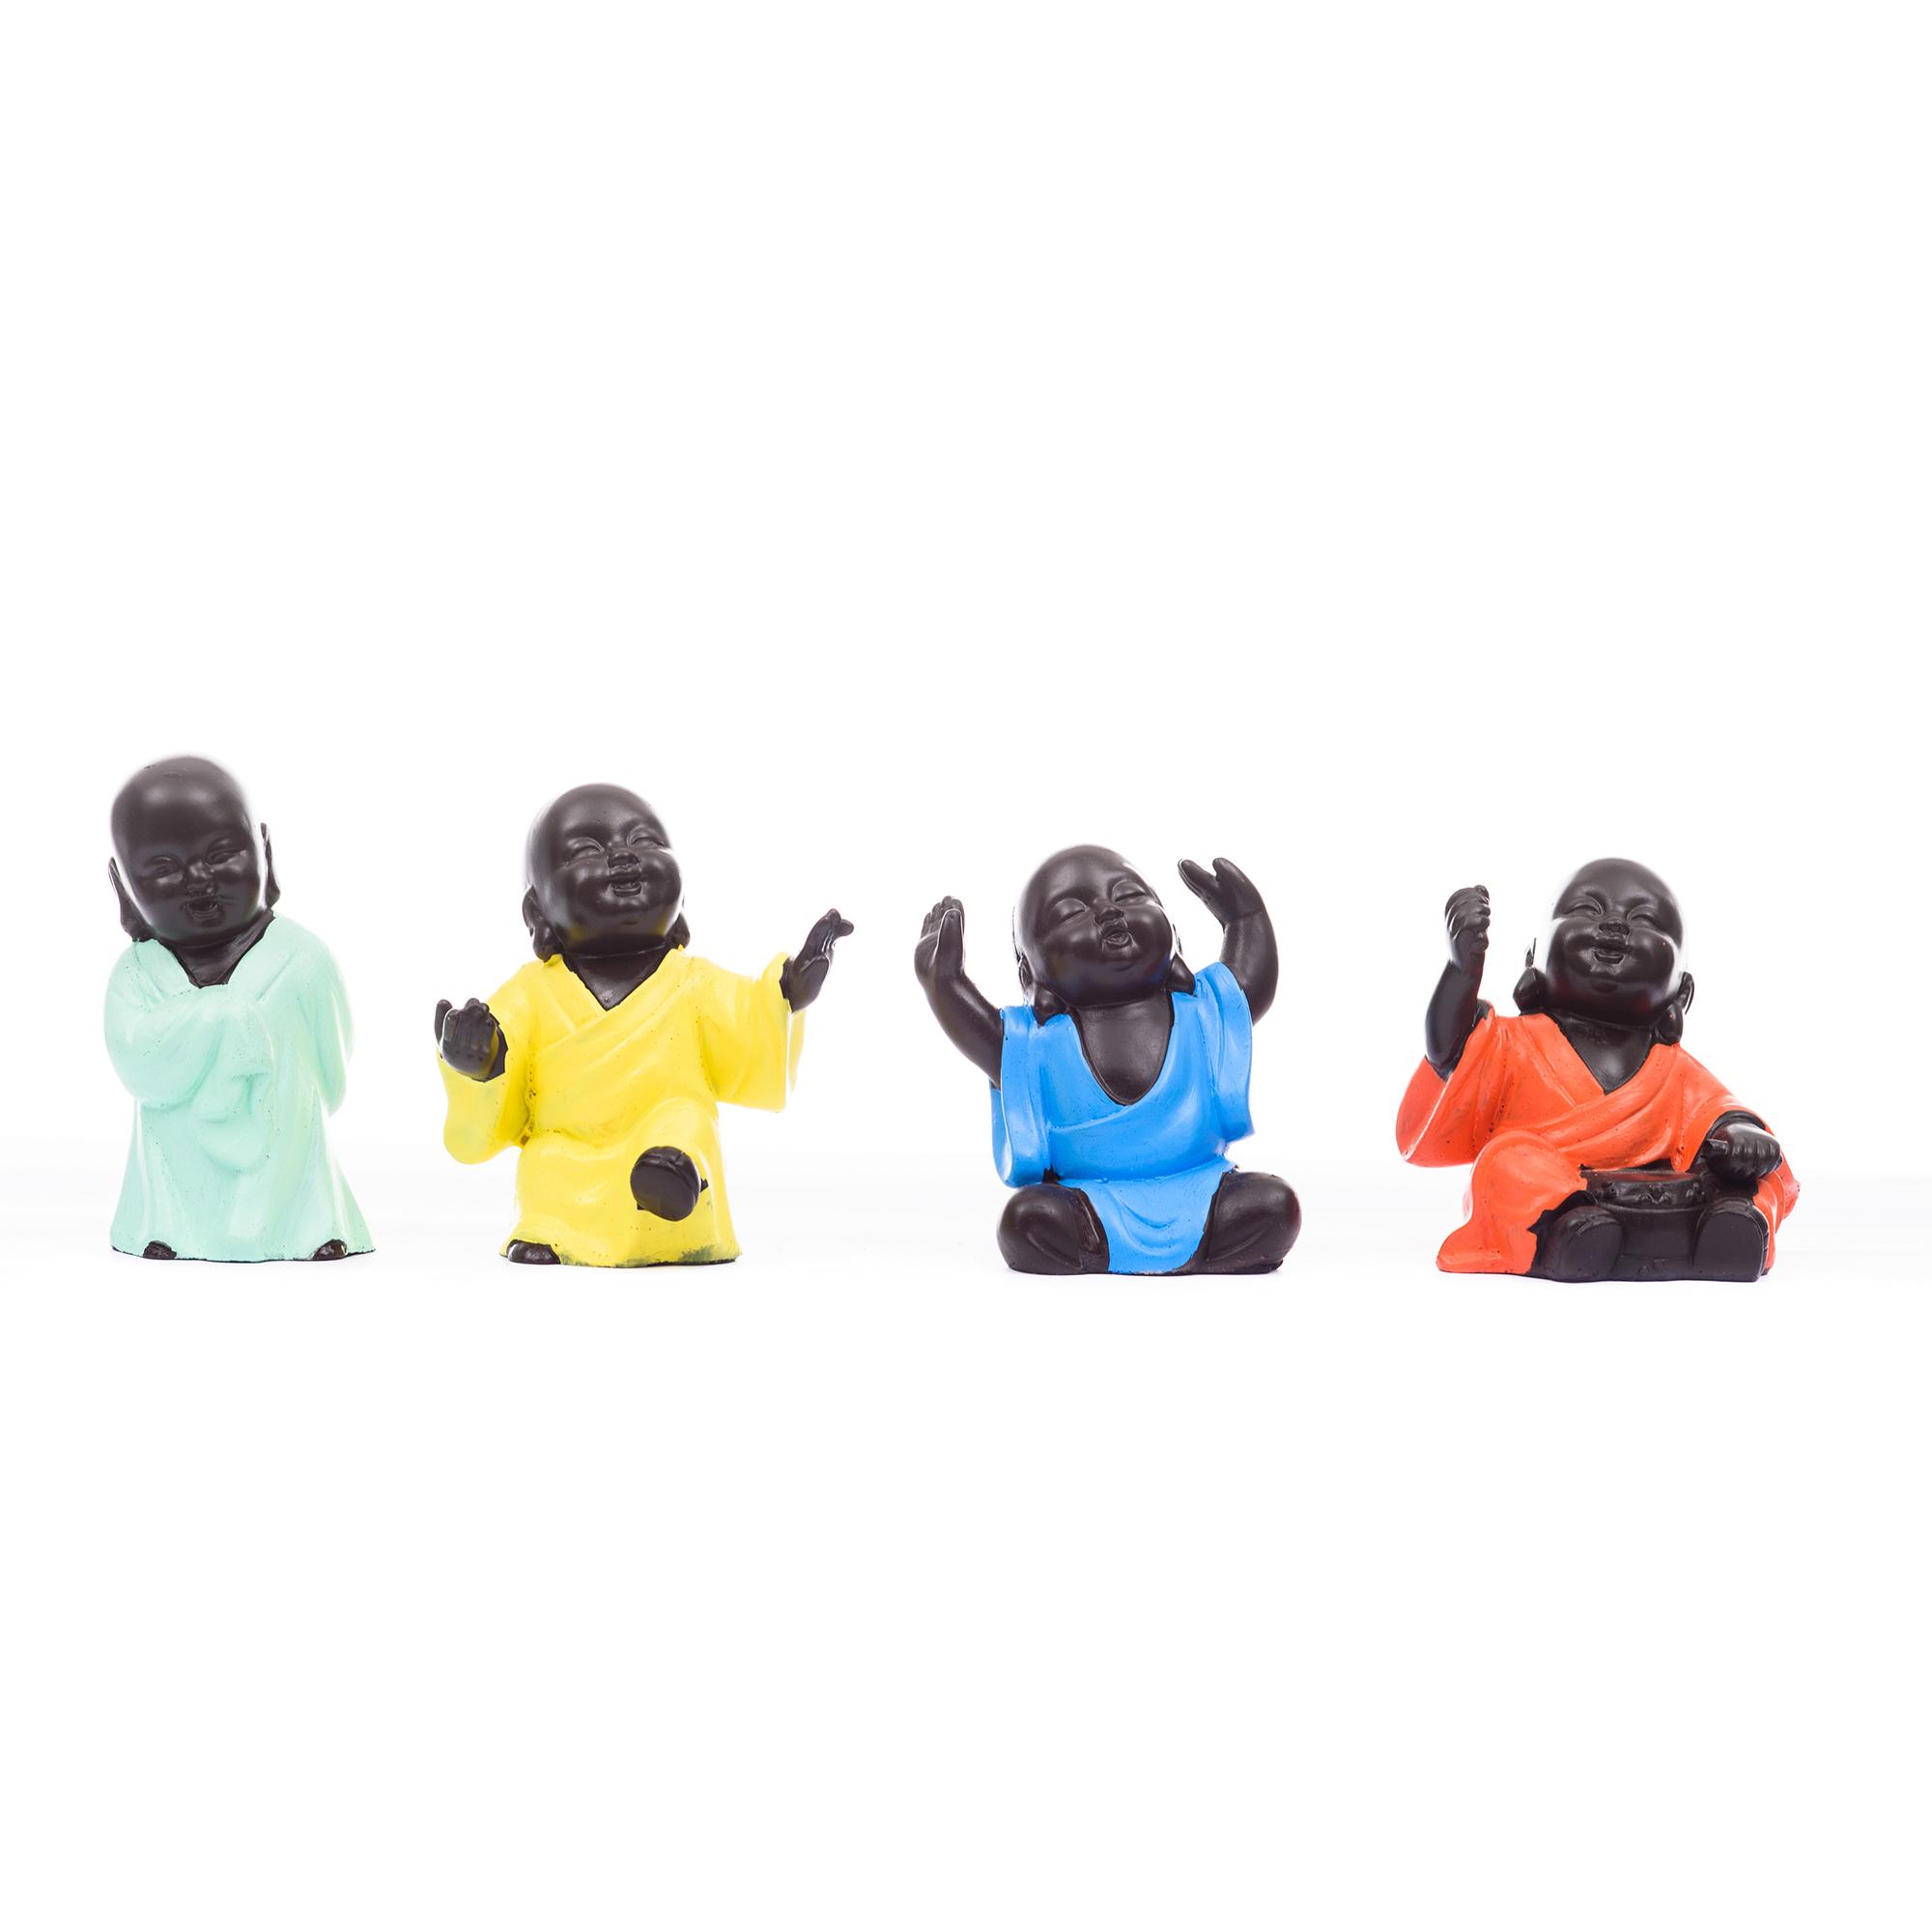 Handcrafted Set of 4 Meditating Buddha- For Home Decor| office Decor| Christmas Decor| Diwali Decor| Vaastu Decor| Fengshui Indian Home Decor